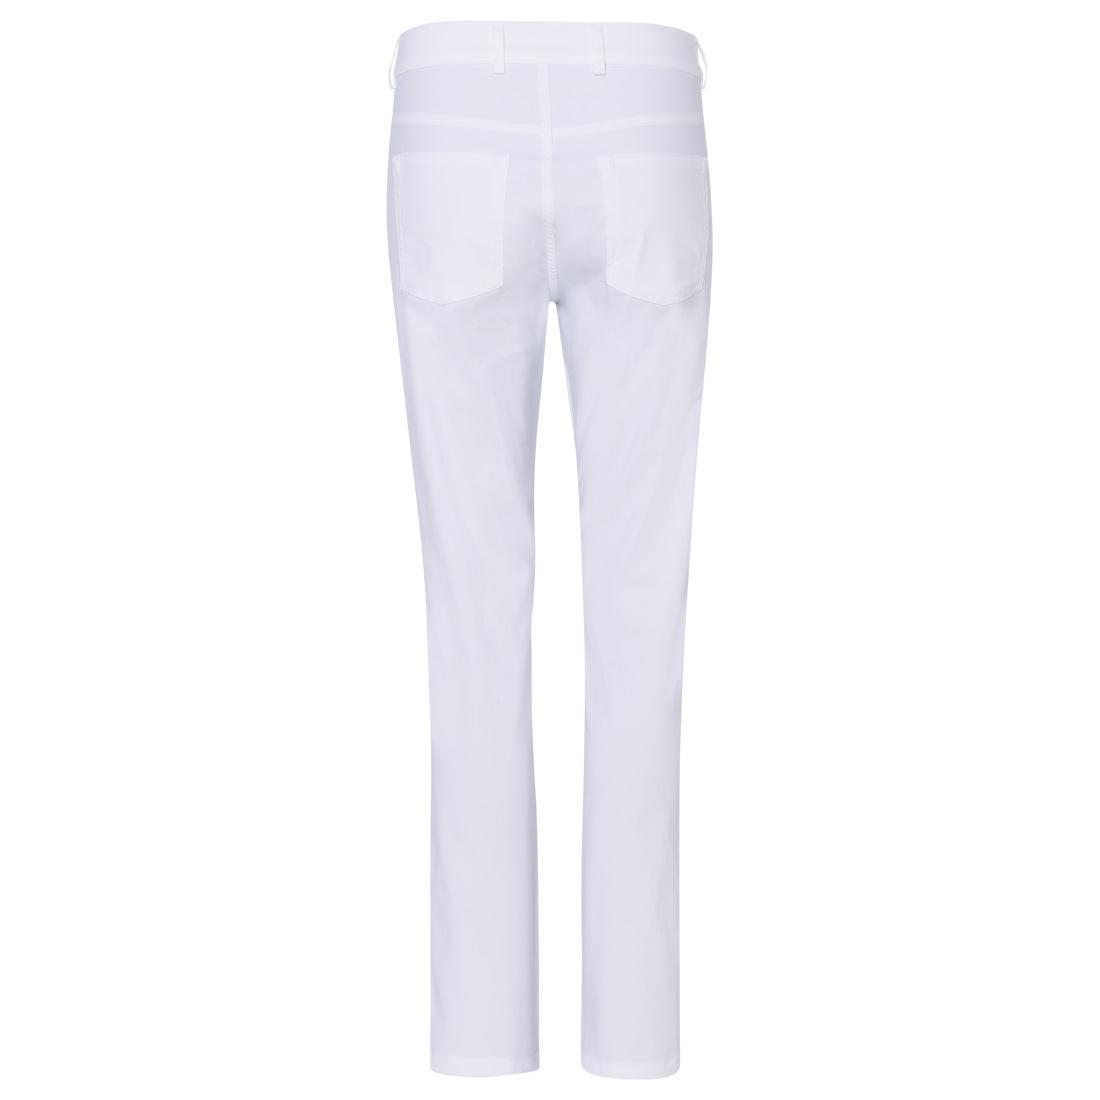 Damen Hose im Denim-Look